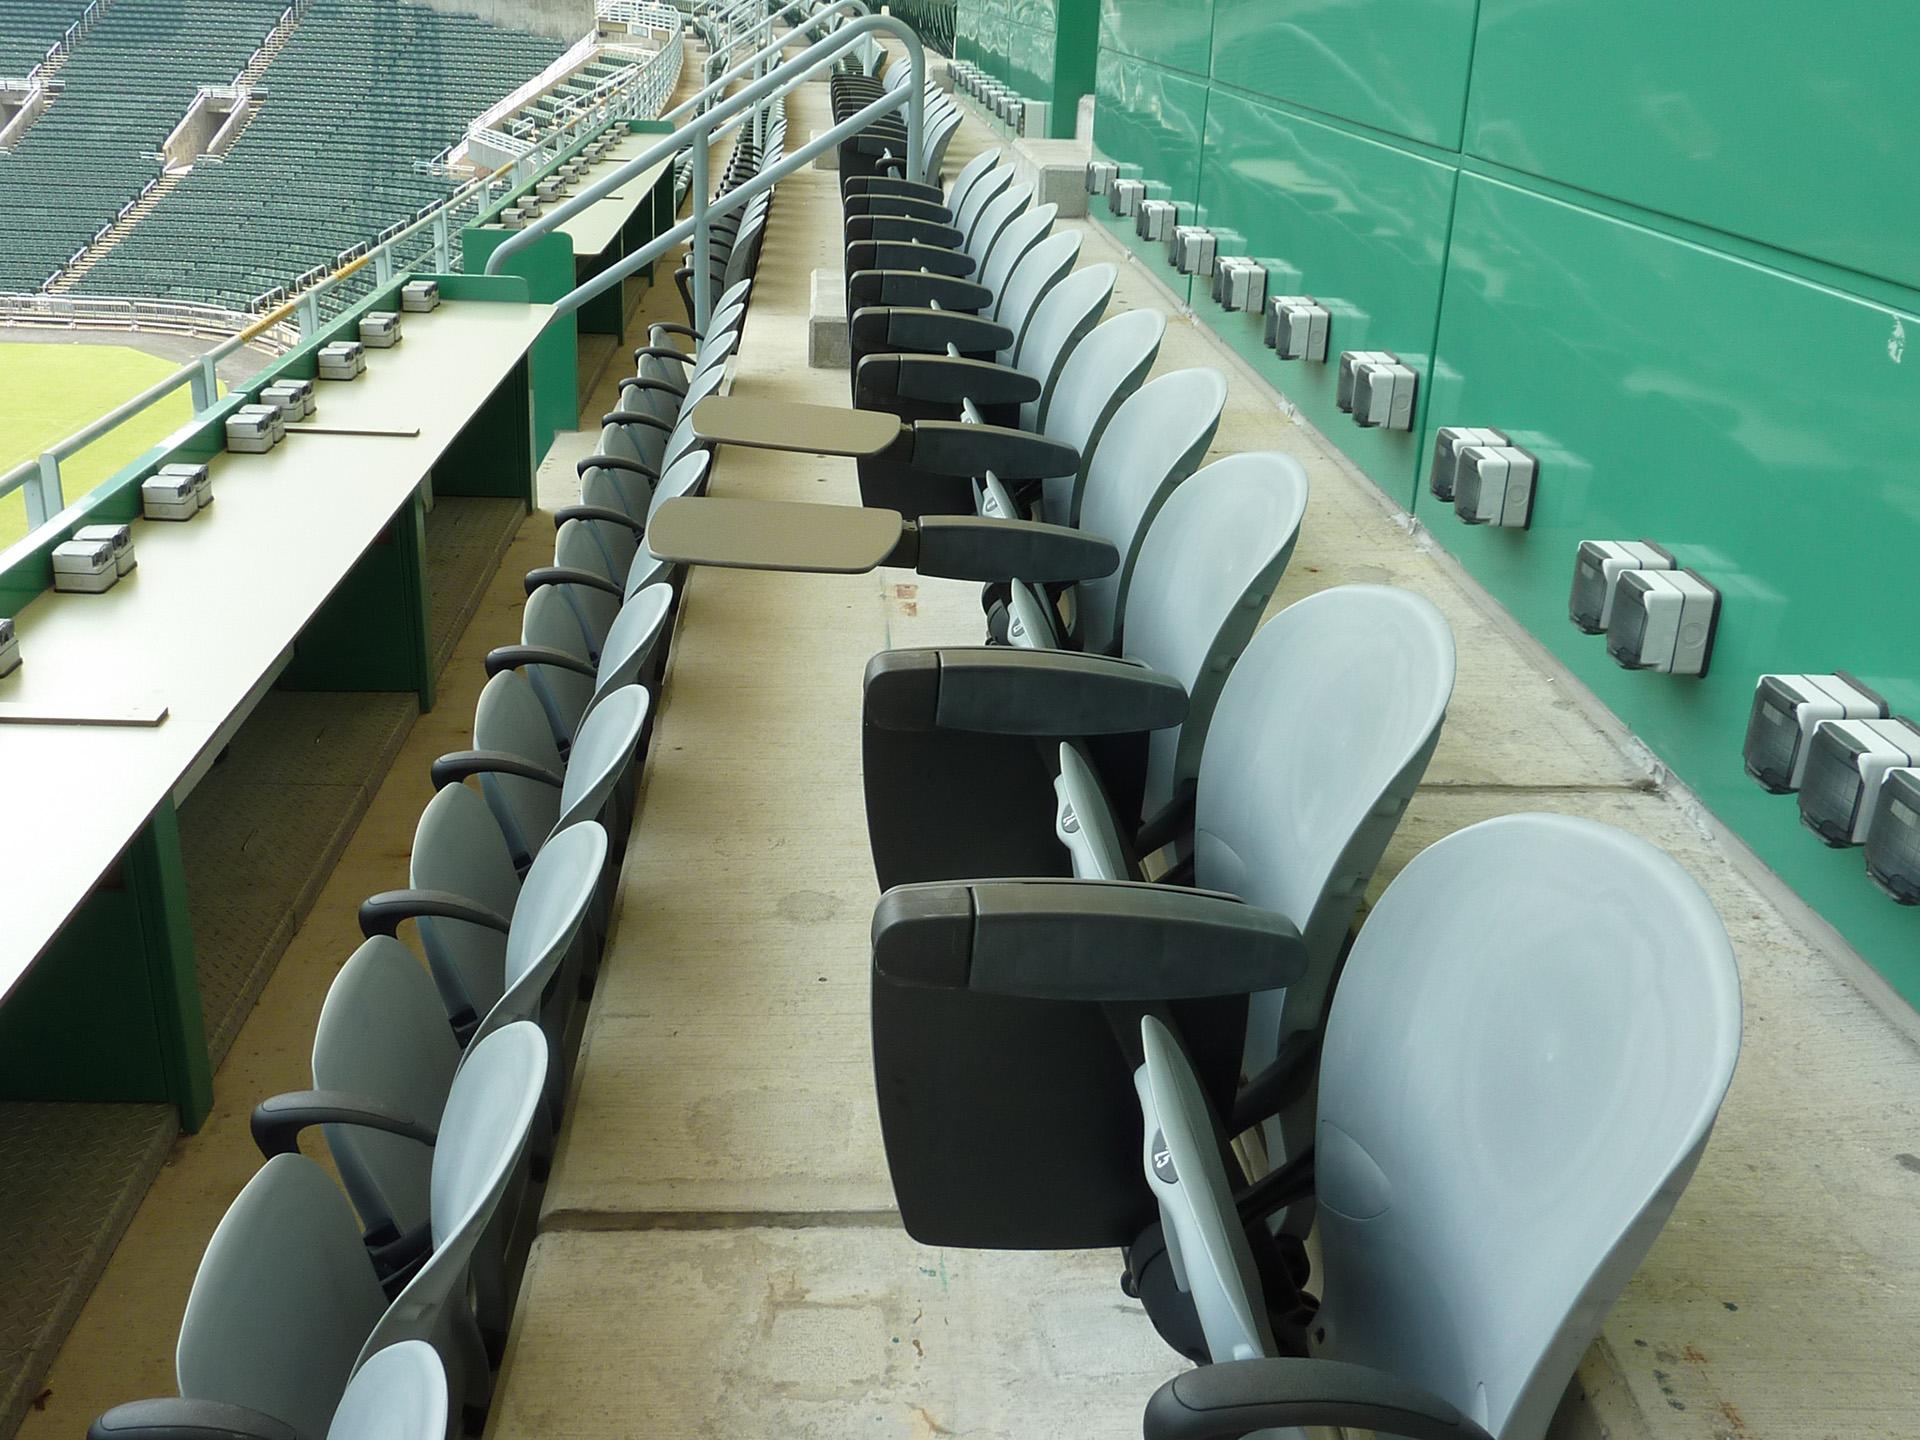 HK Stadium Photo 2 004.jpg